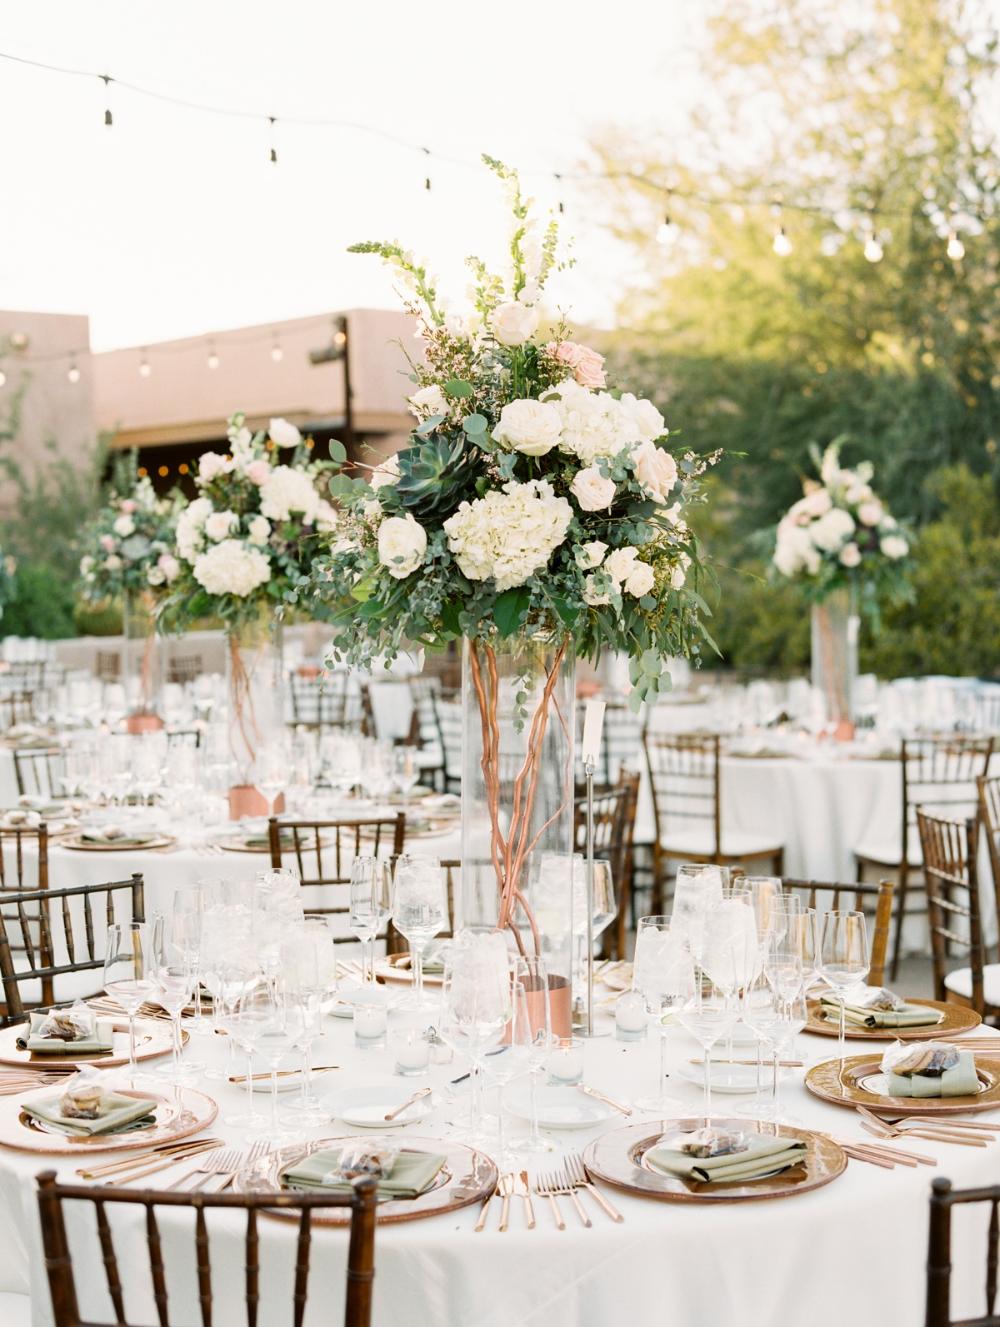 A Blush And Copper Cactus Themed Wedding #tabledecor #tallcenterpieces #weddinginspo #tabledecor